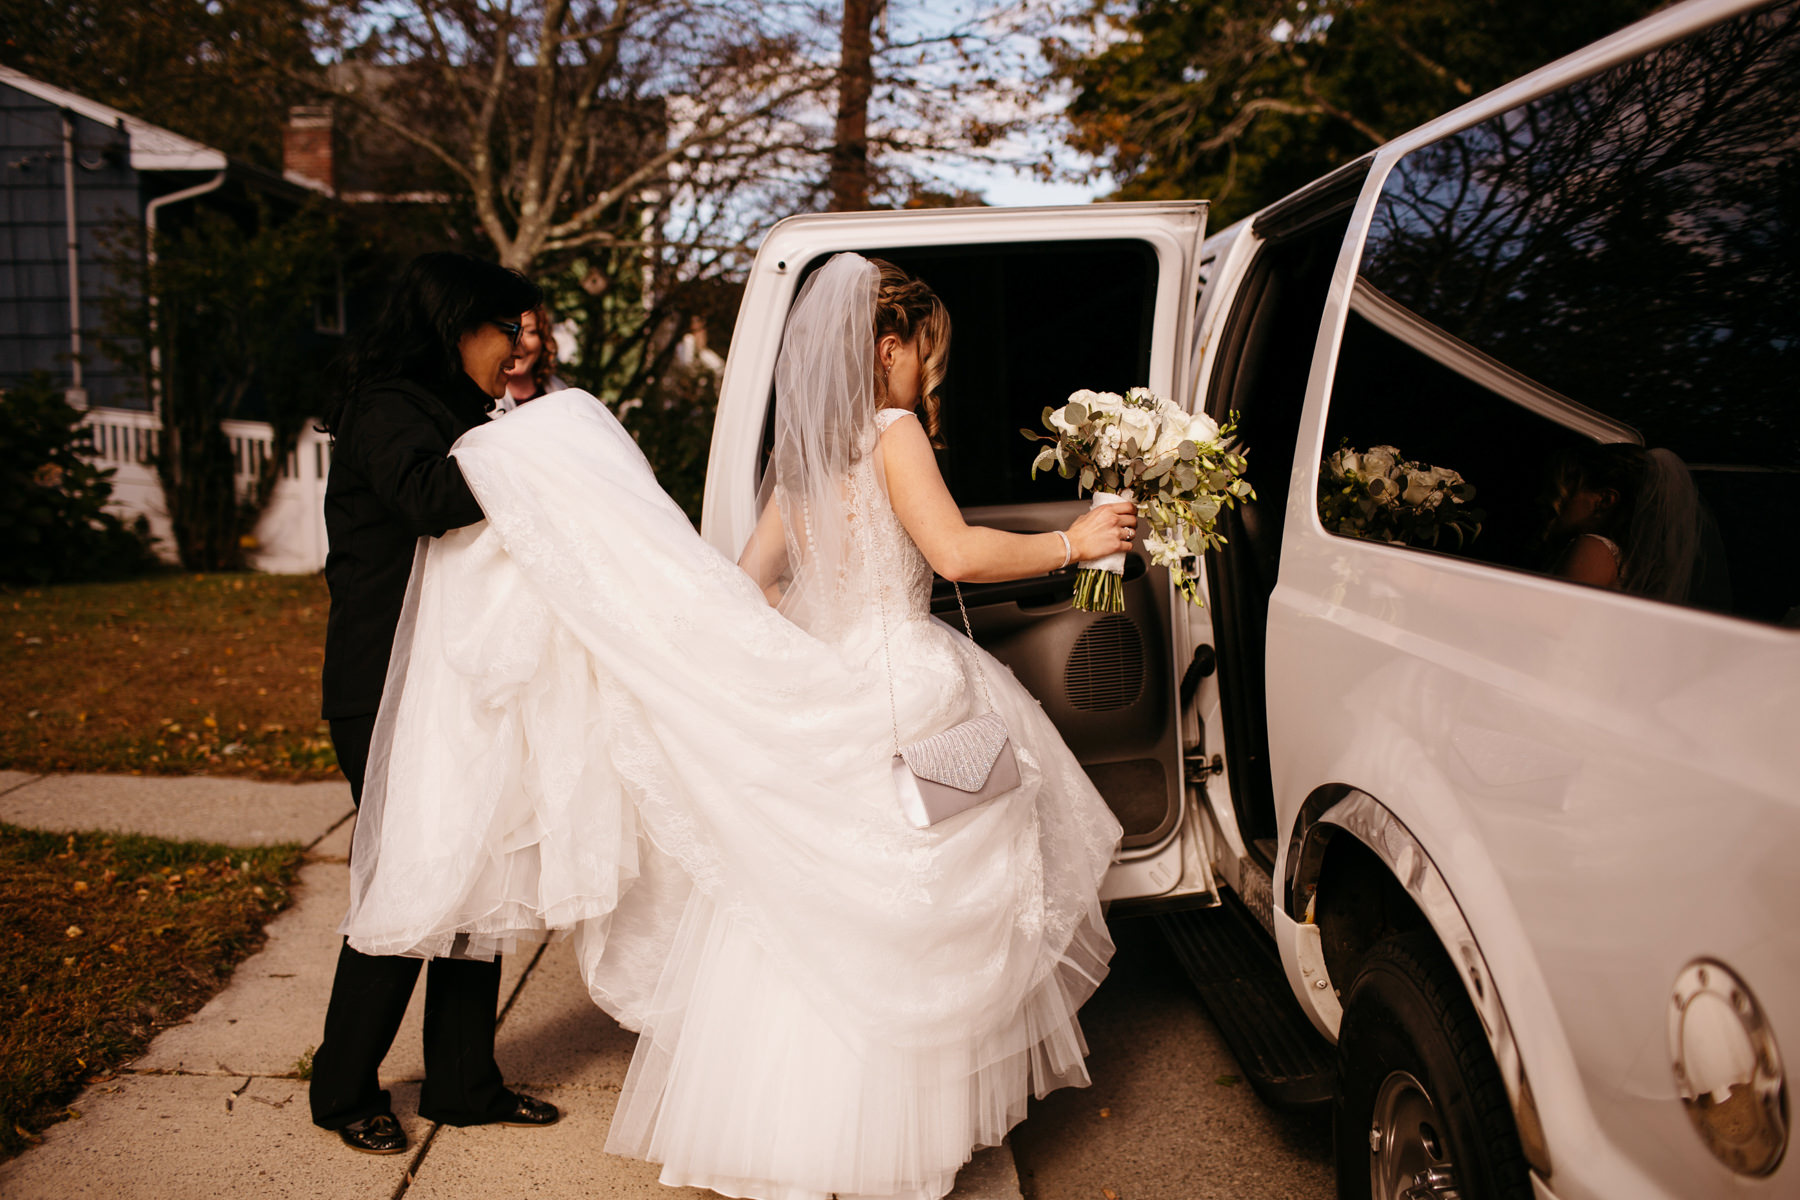 Quincy Ma Massachusetts Wedding Dedham Boston Granie Links Wedding New England Catholic Cathedral Liz Osban Photography 23.jpg